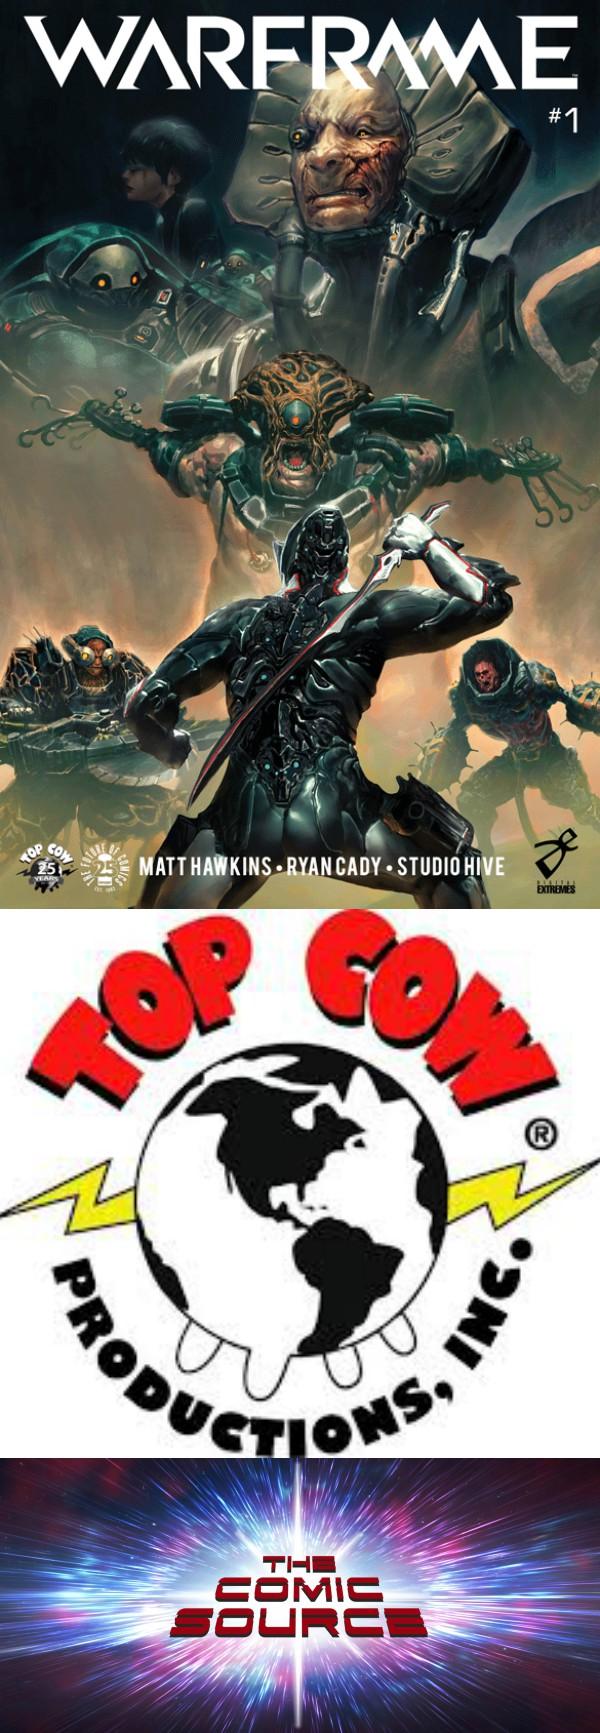 The Comic Source Podcast Episode 279 – Top Cow Thursday Warframe Spotlight